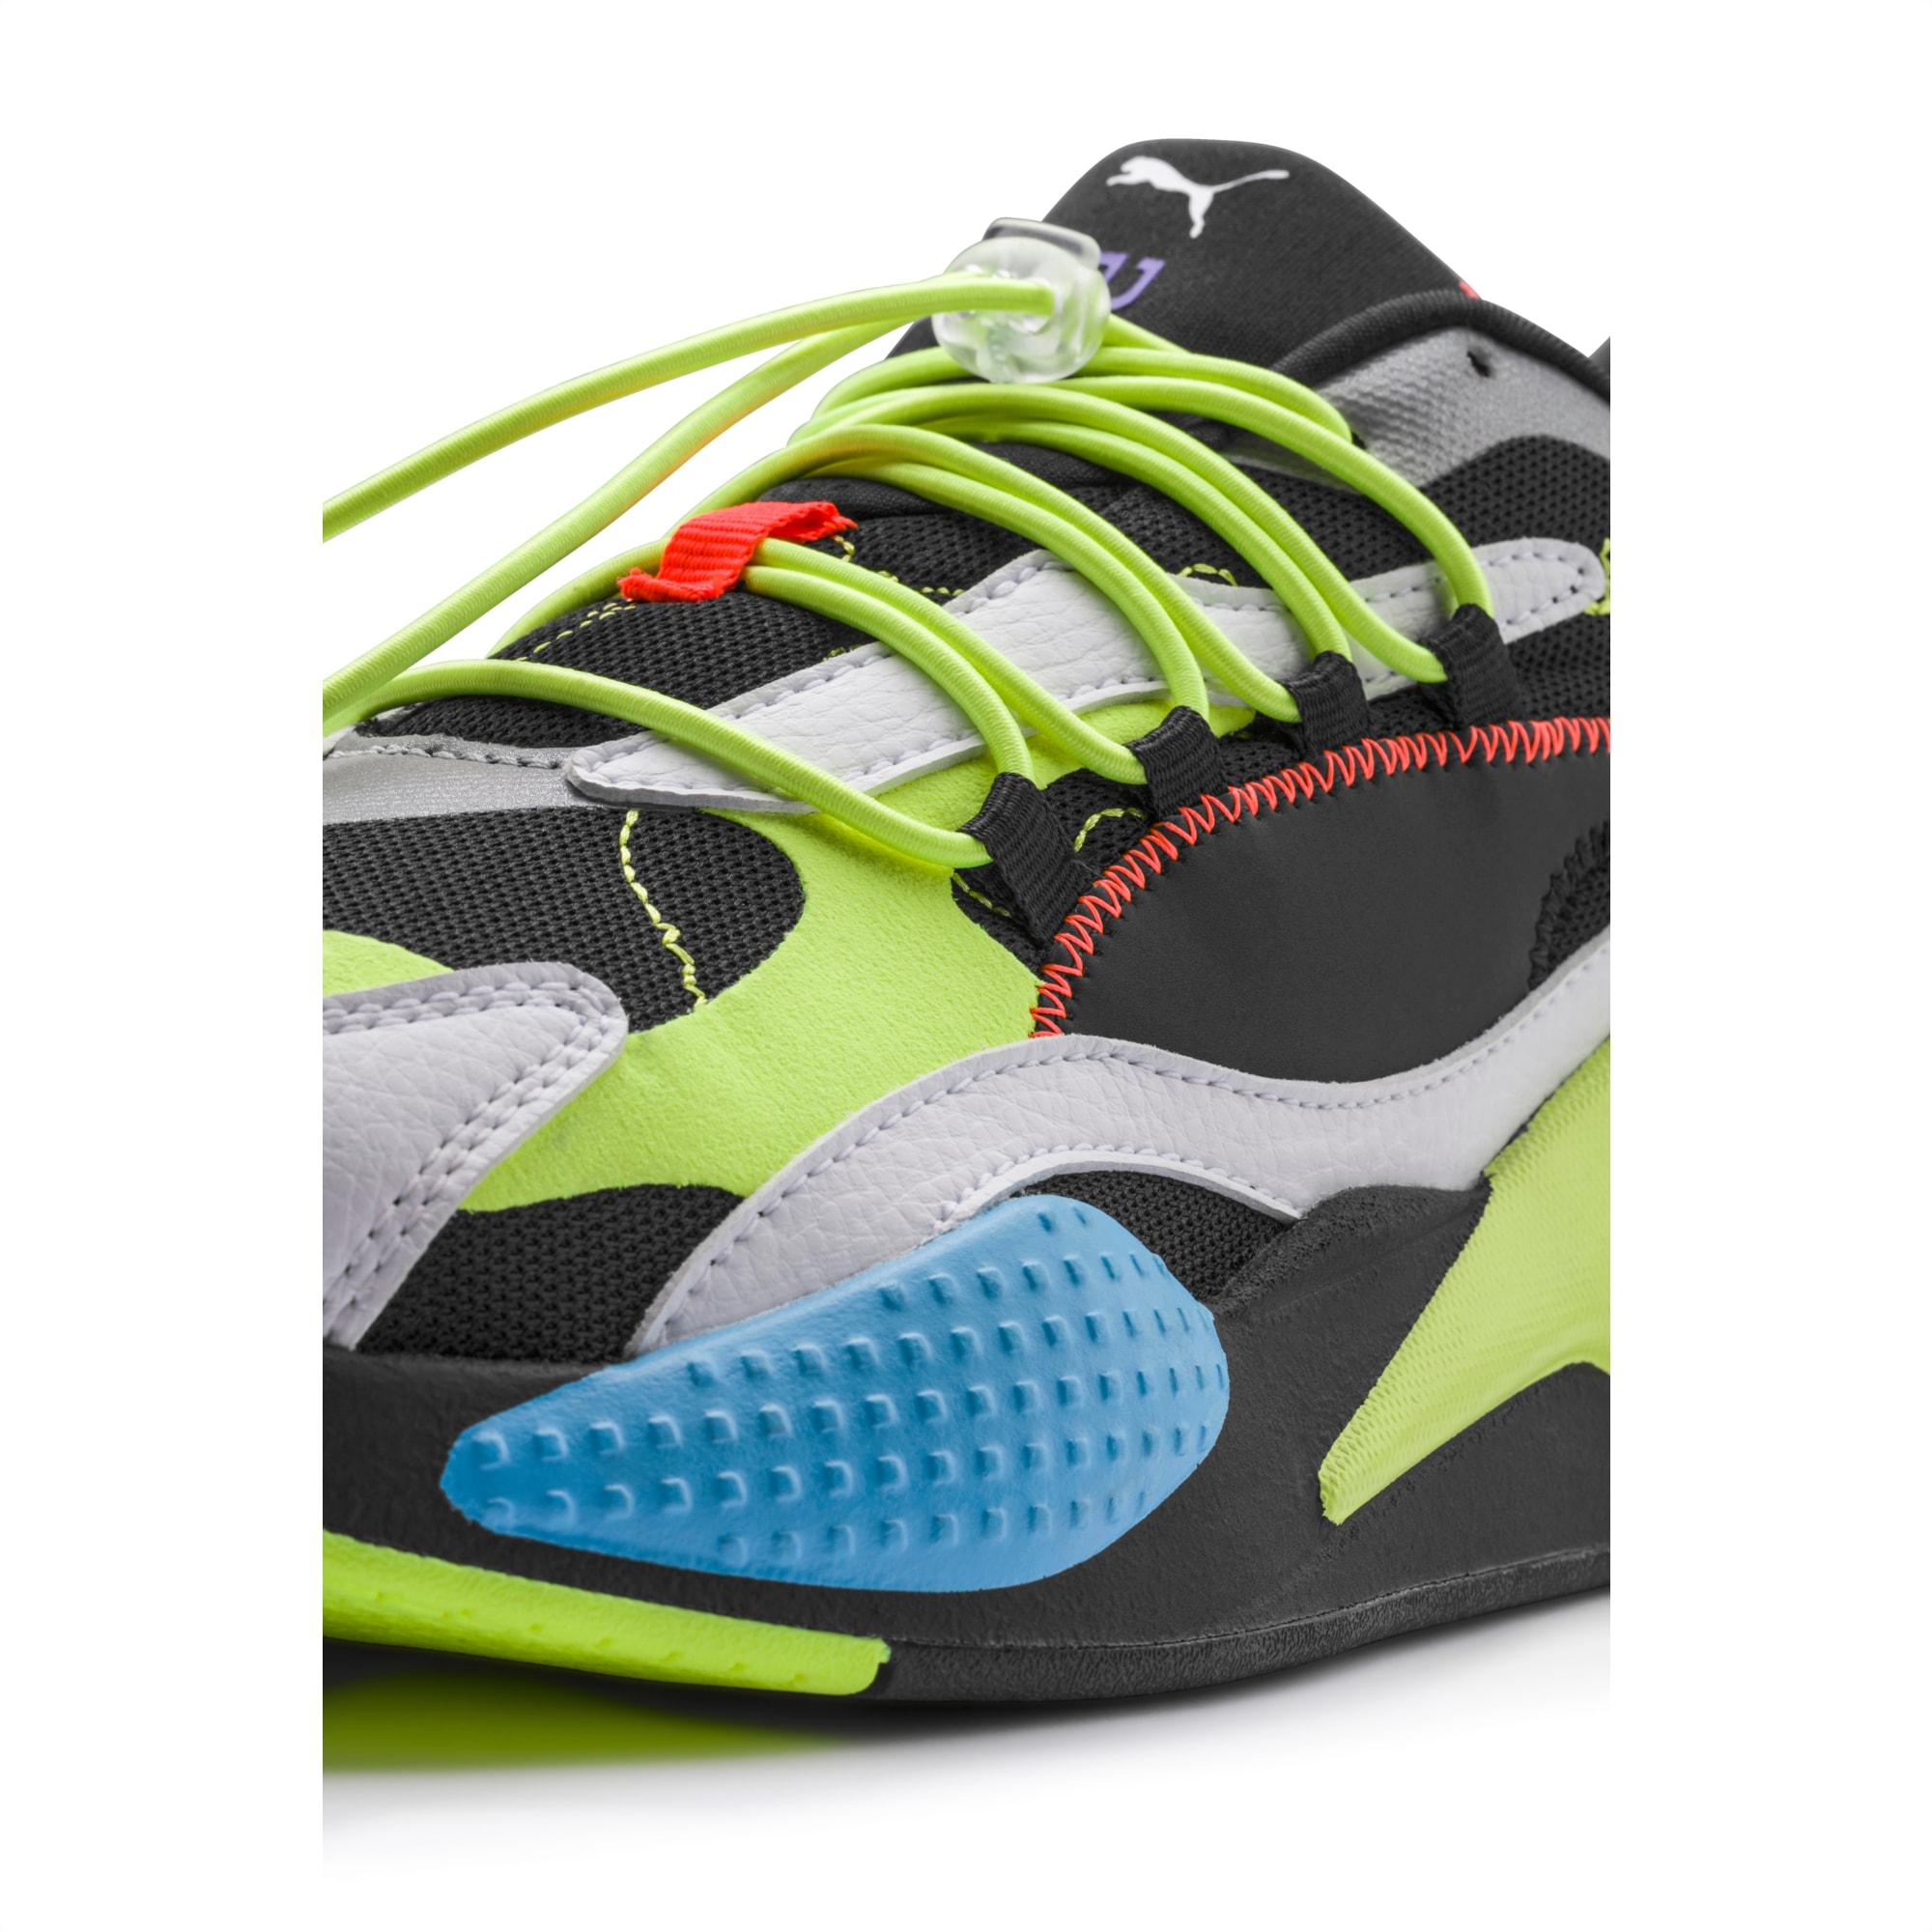 PUMA x CENTRAL SAINT MARTINS RS X³ Men's Sneakers